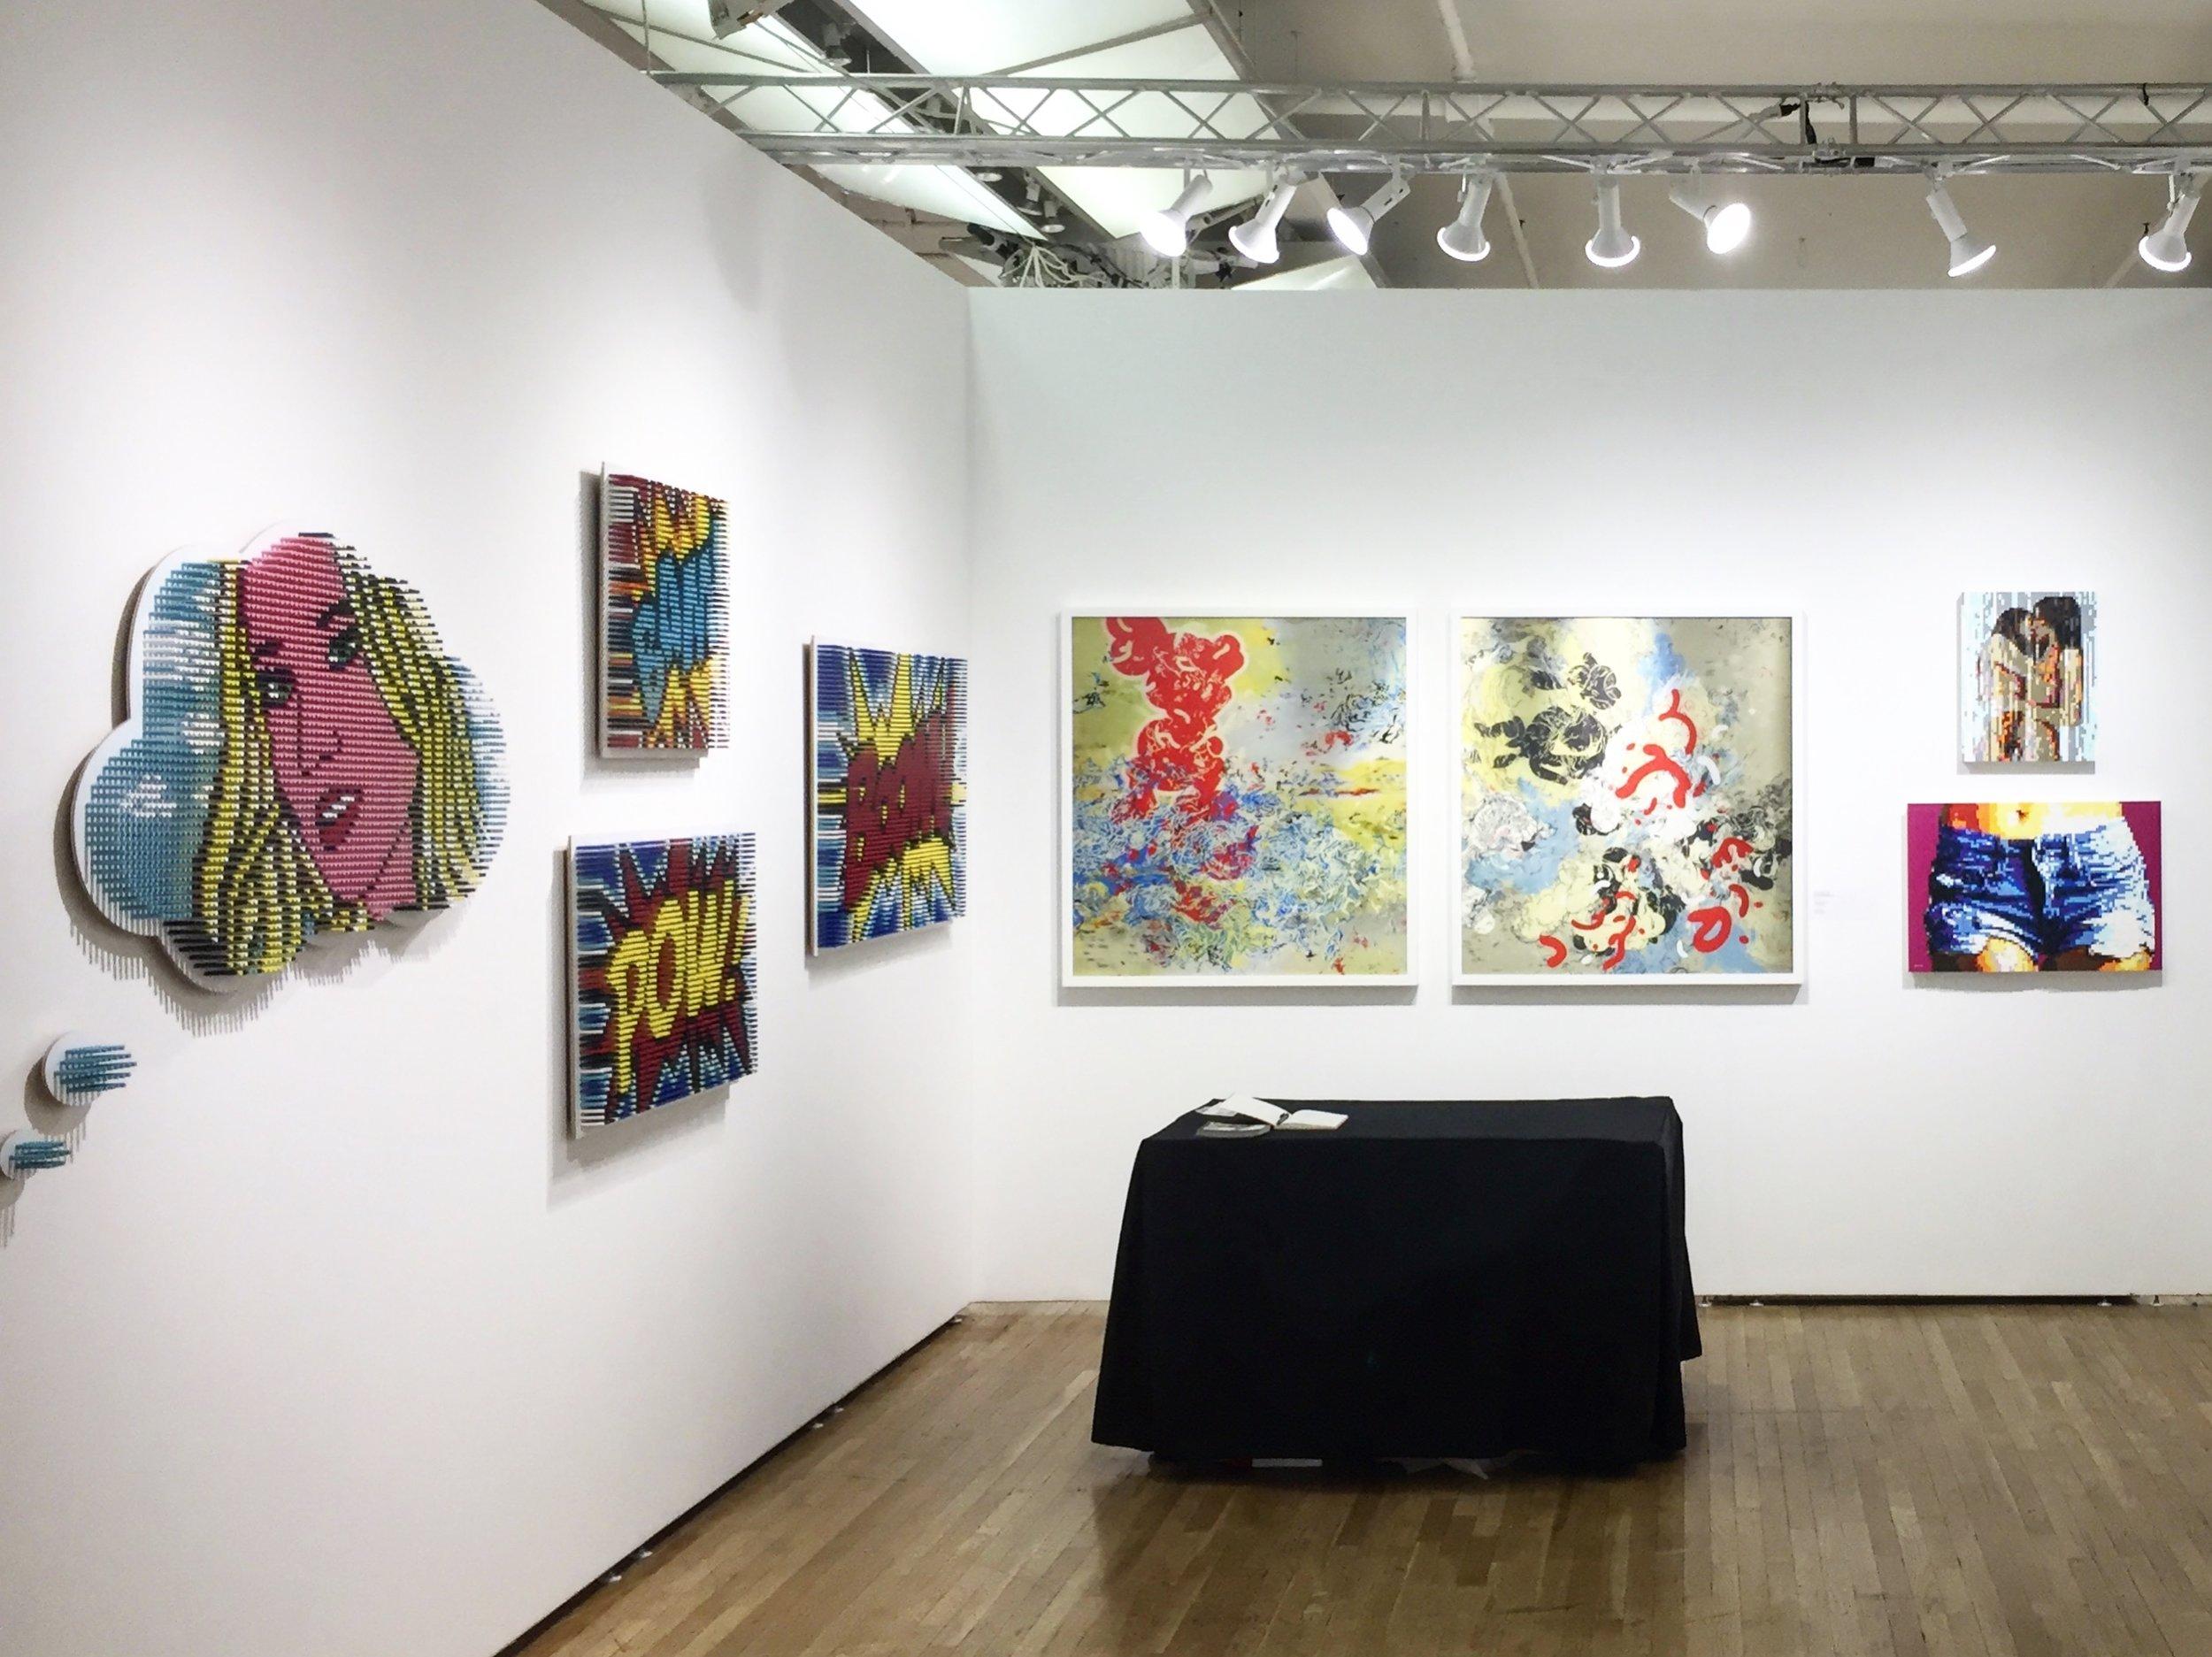 Affordable Art Fair 2017, New York, NY